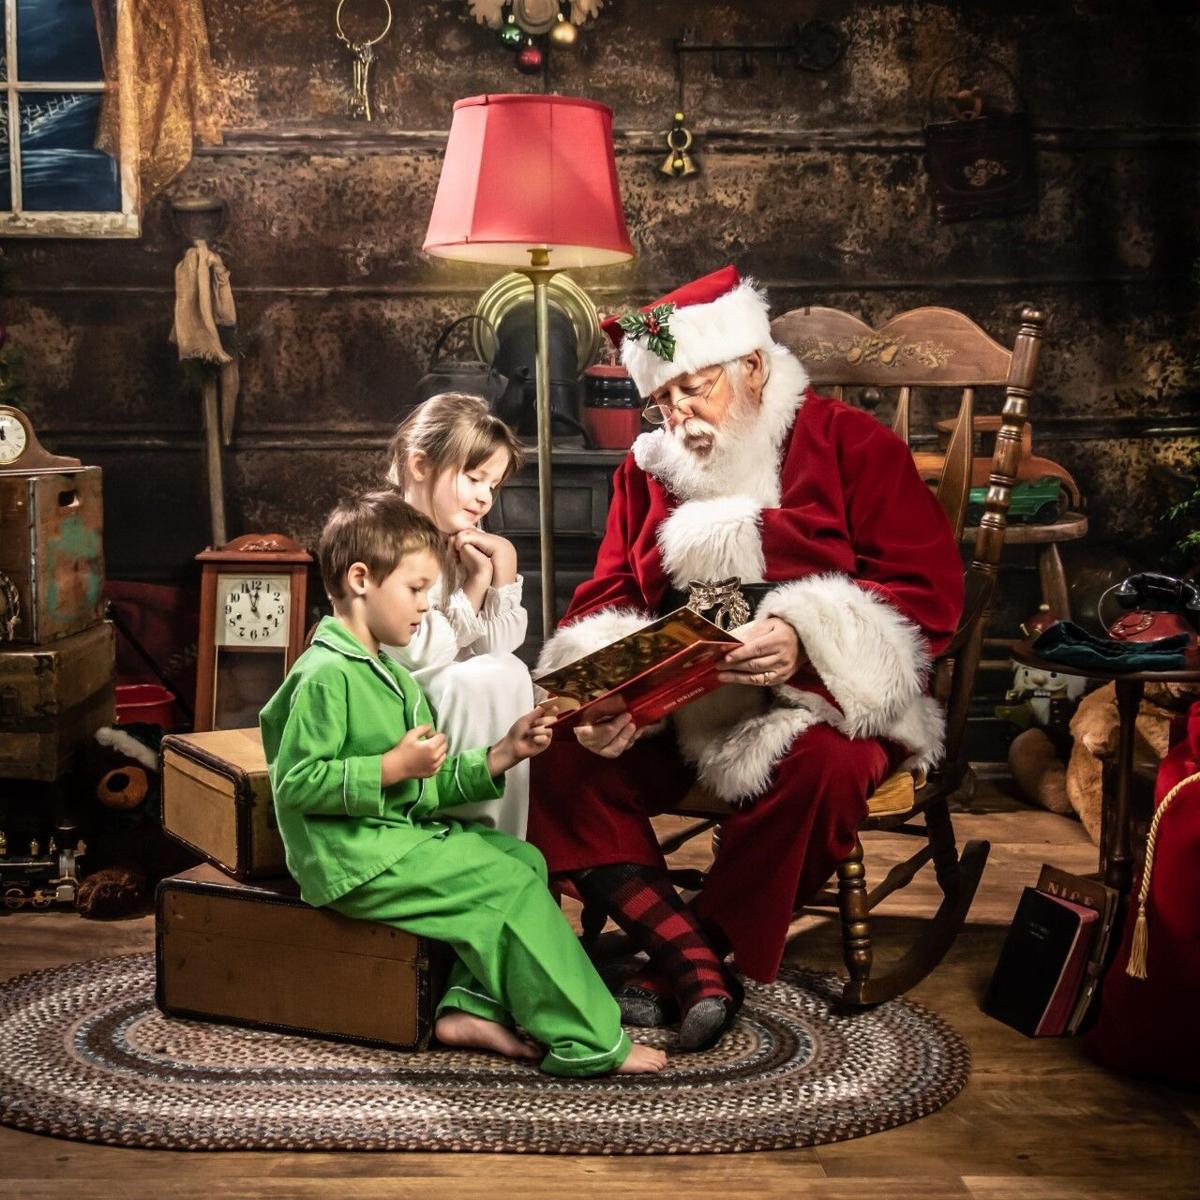 A1 A visit with Santa 2.jpg